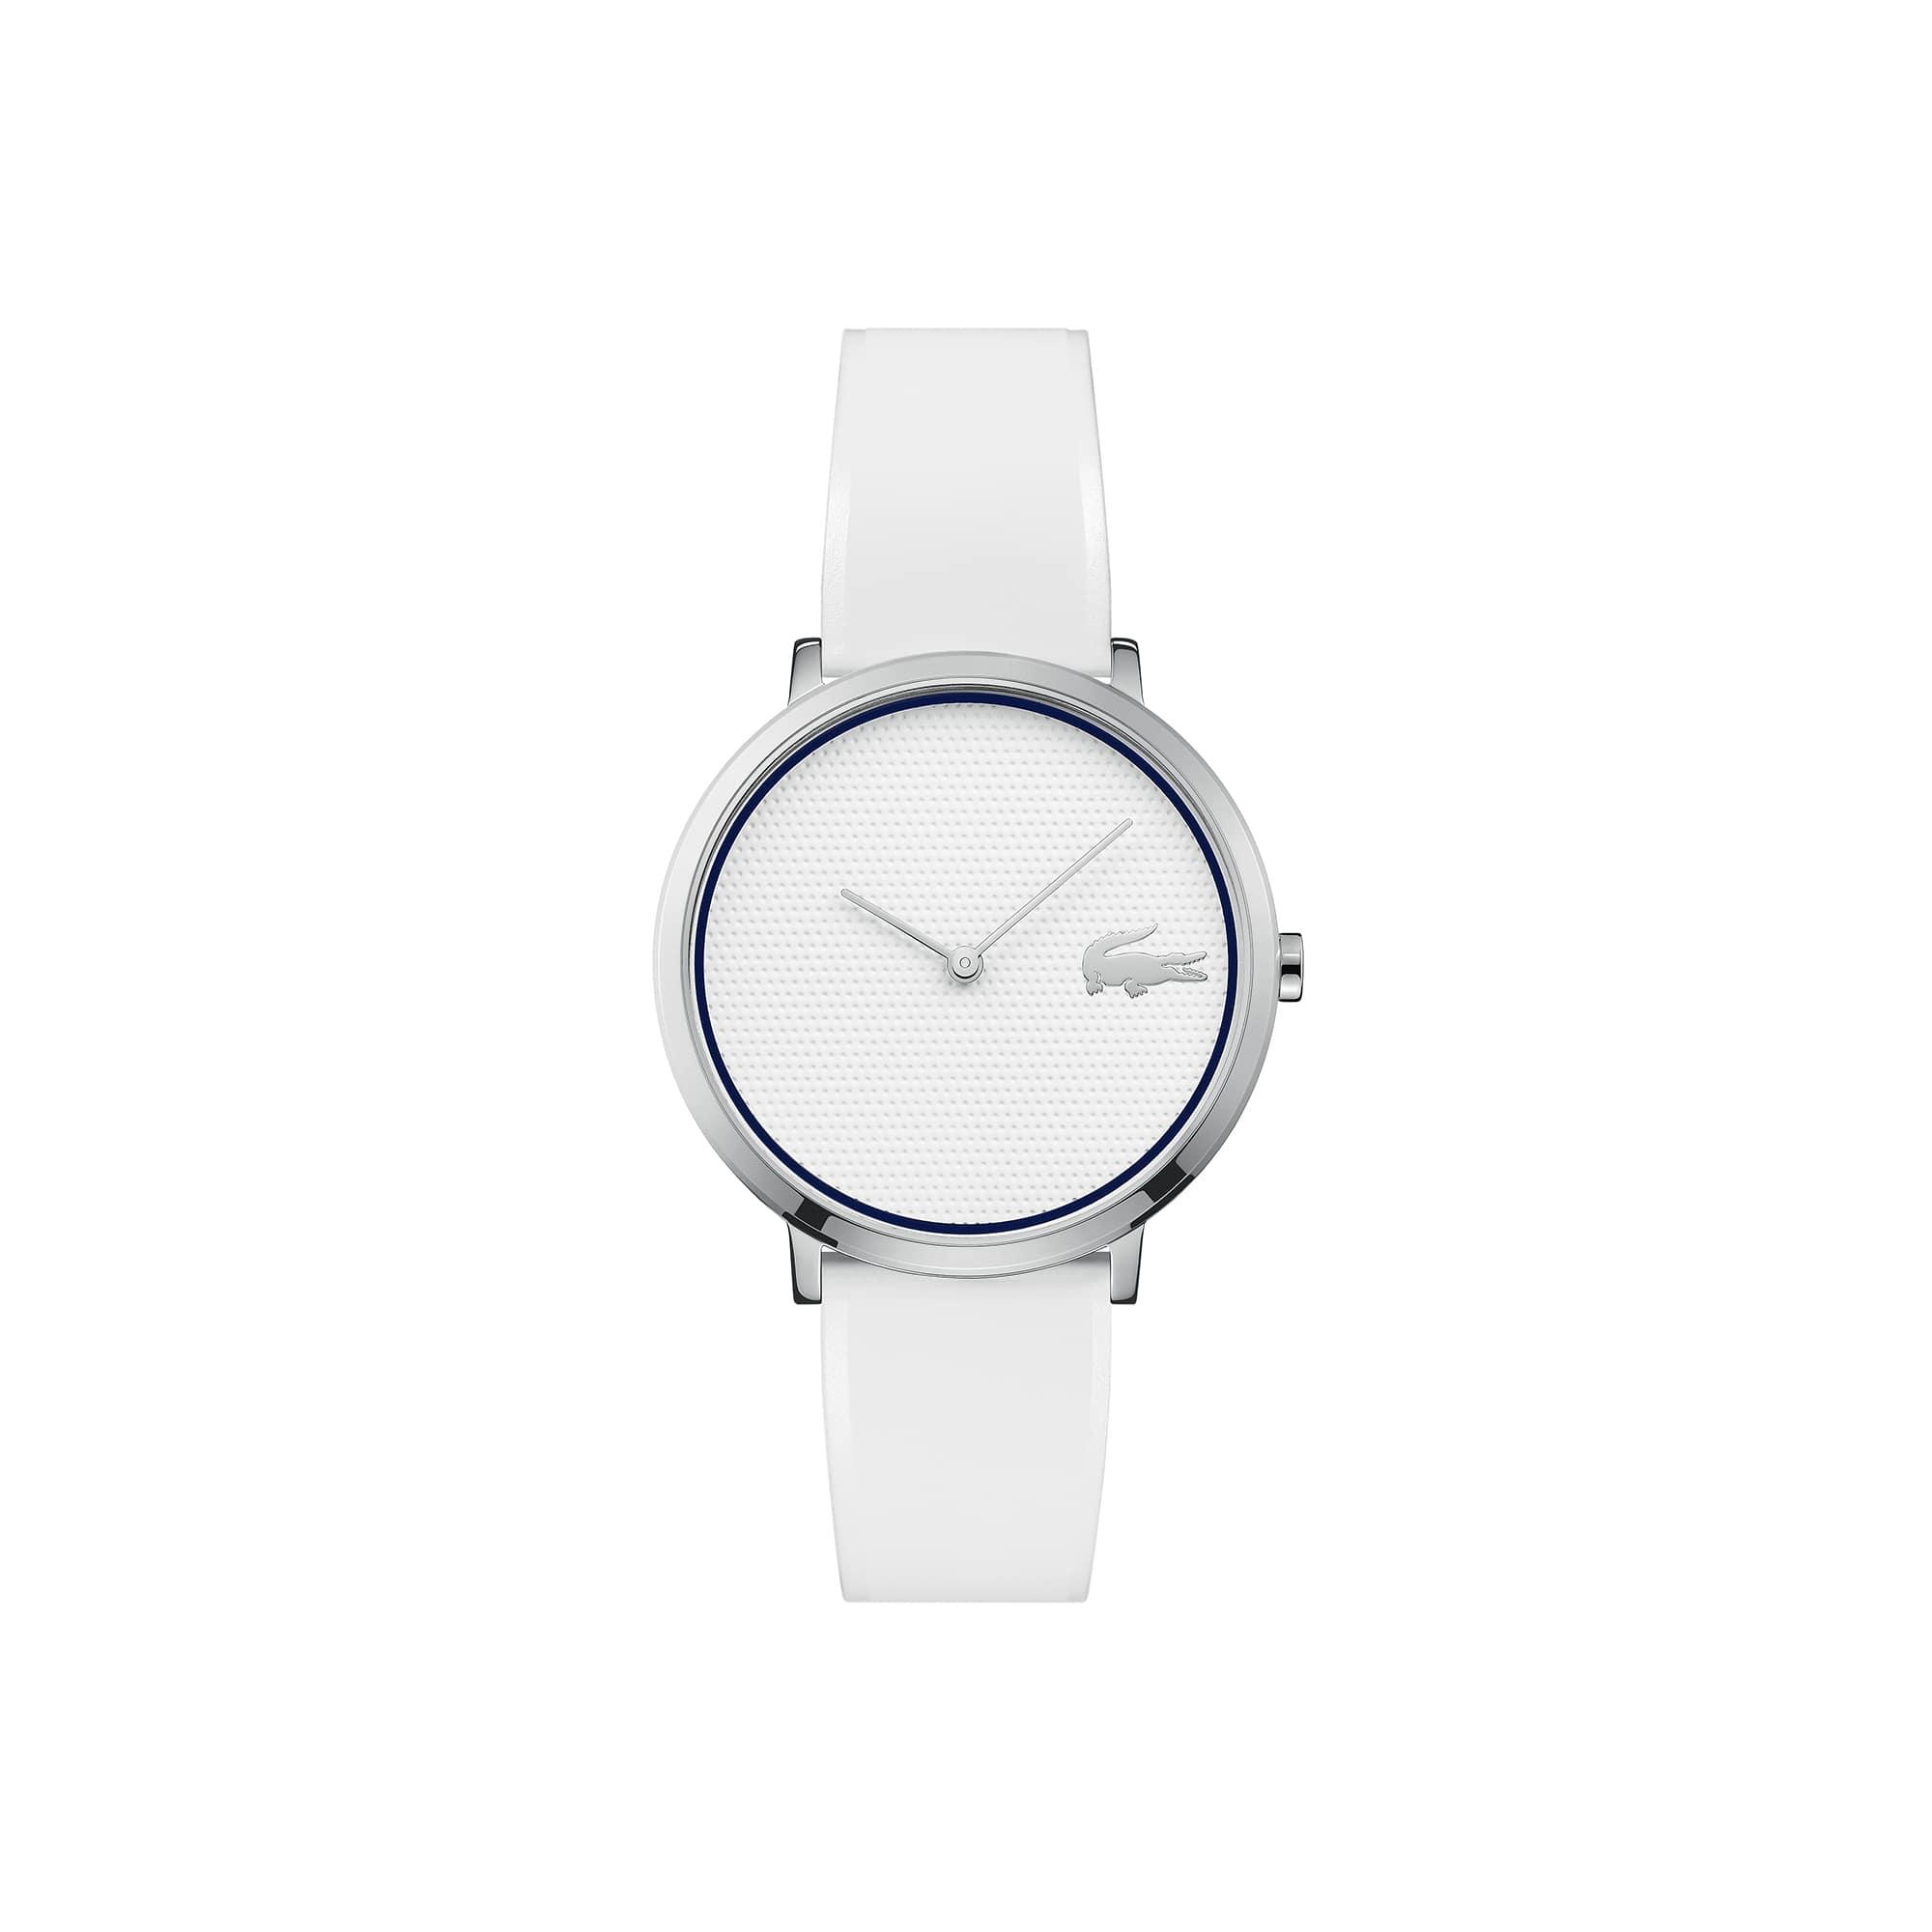 Relógio ultra slim Moon de mulher Golf Capsule com bracelete de silicone branca